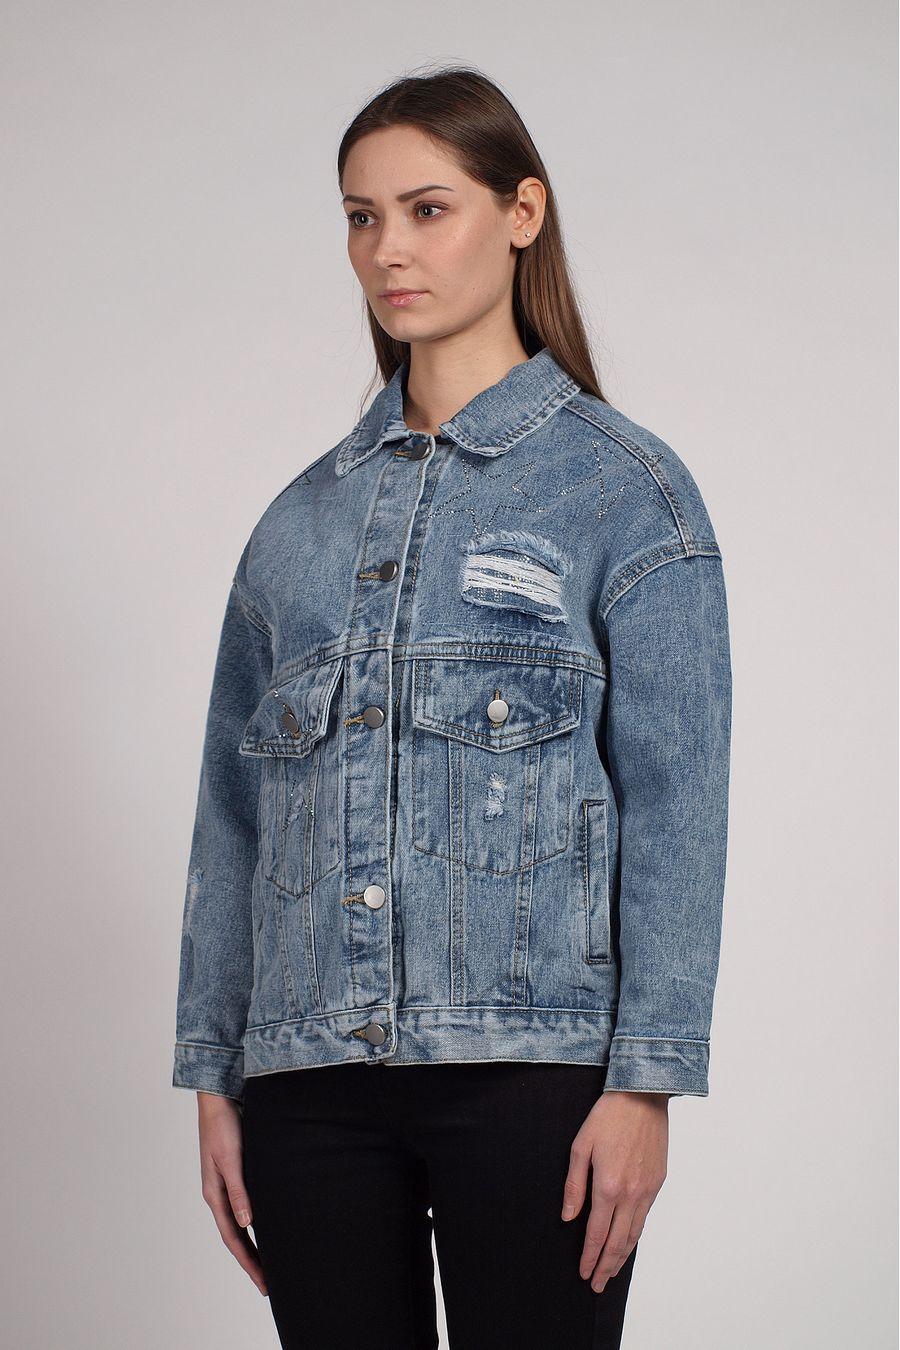 Жакет женский (джинсовка) LRZBS 2059 - фото 2